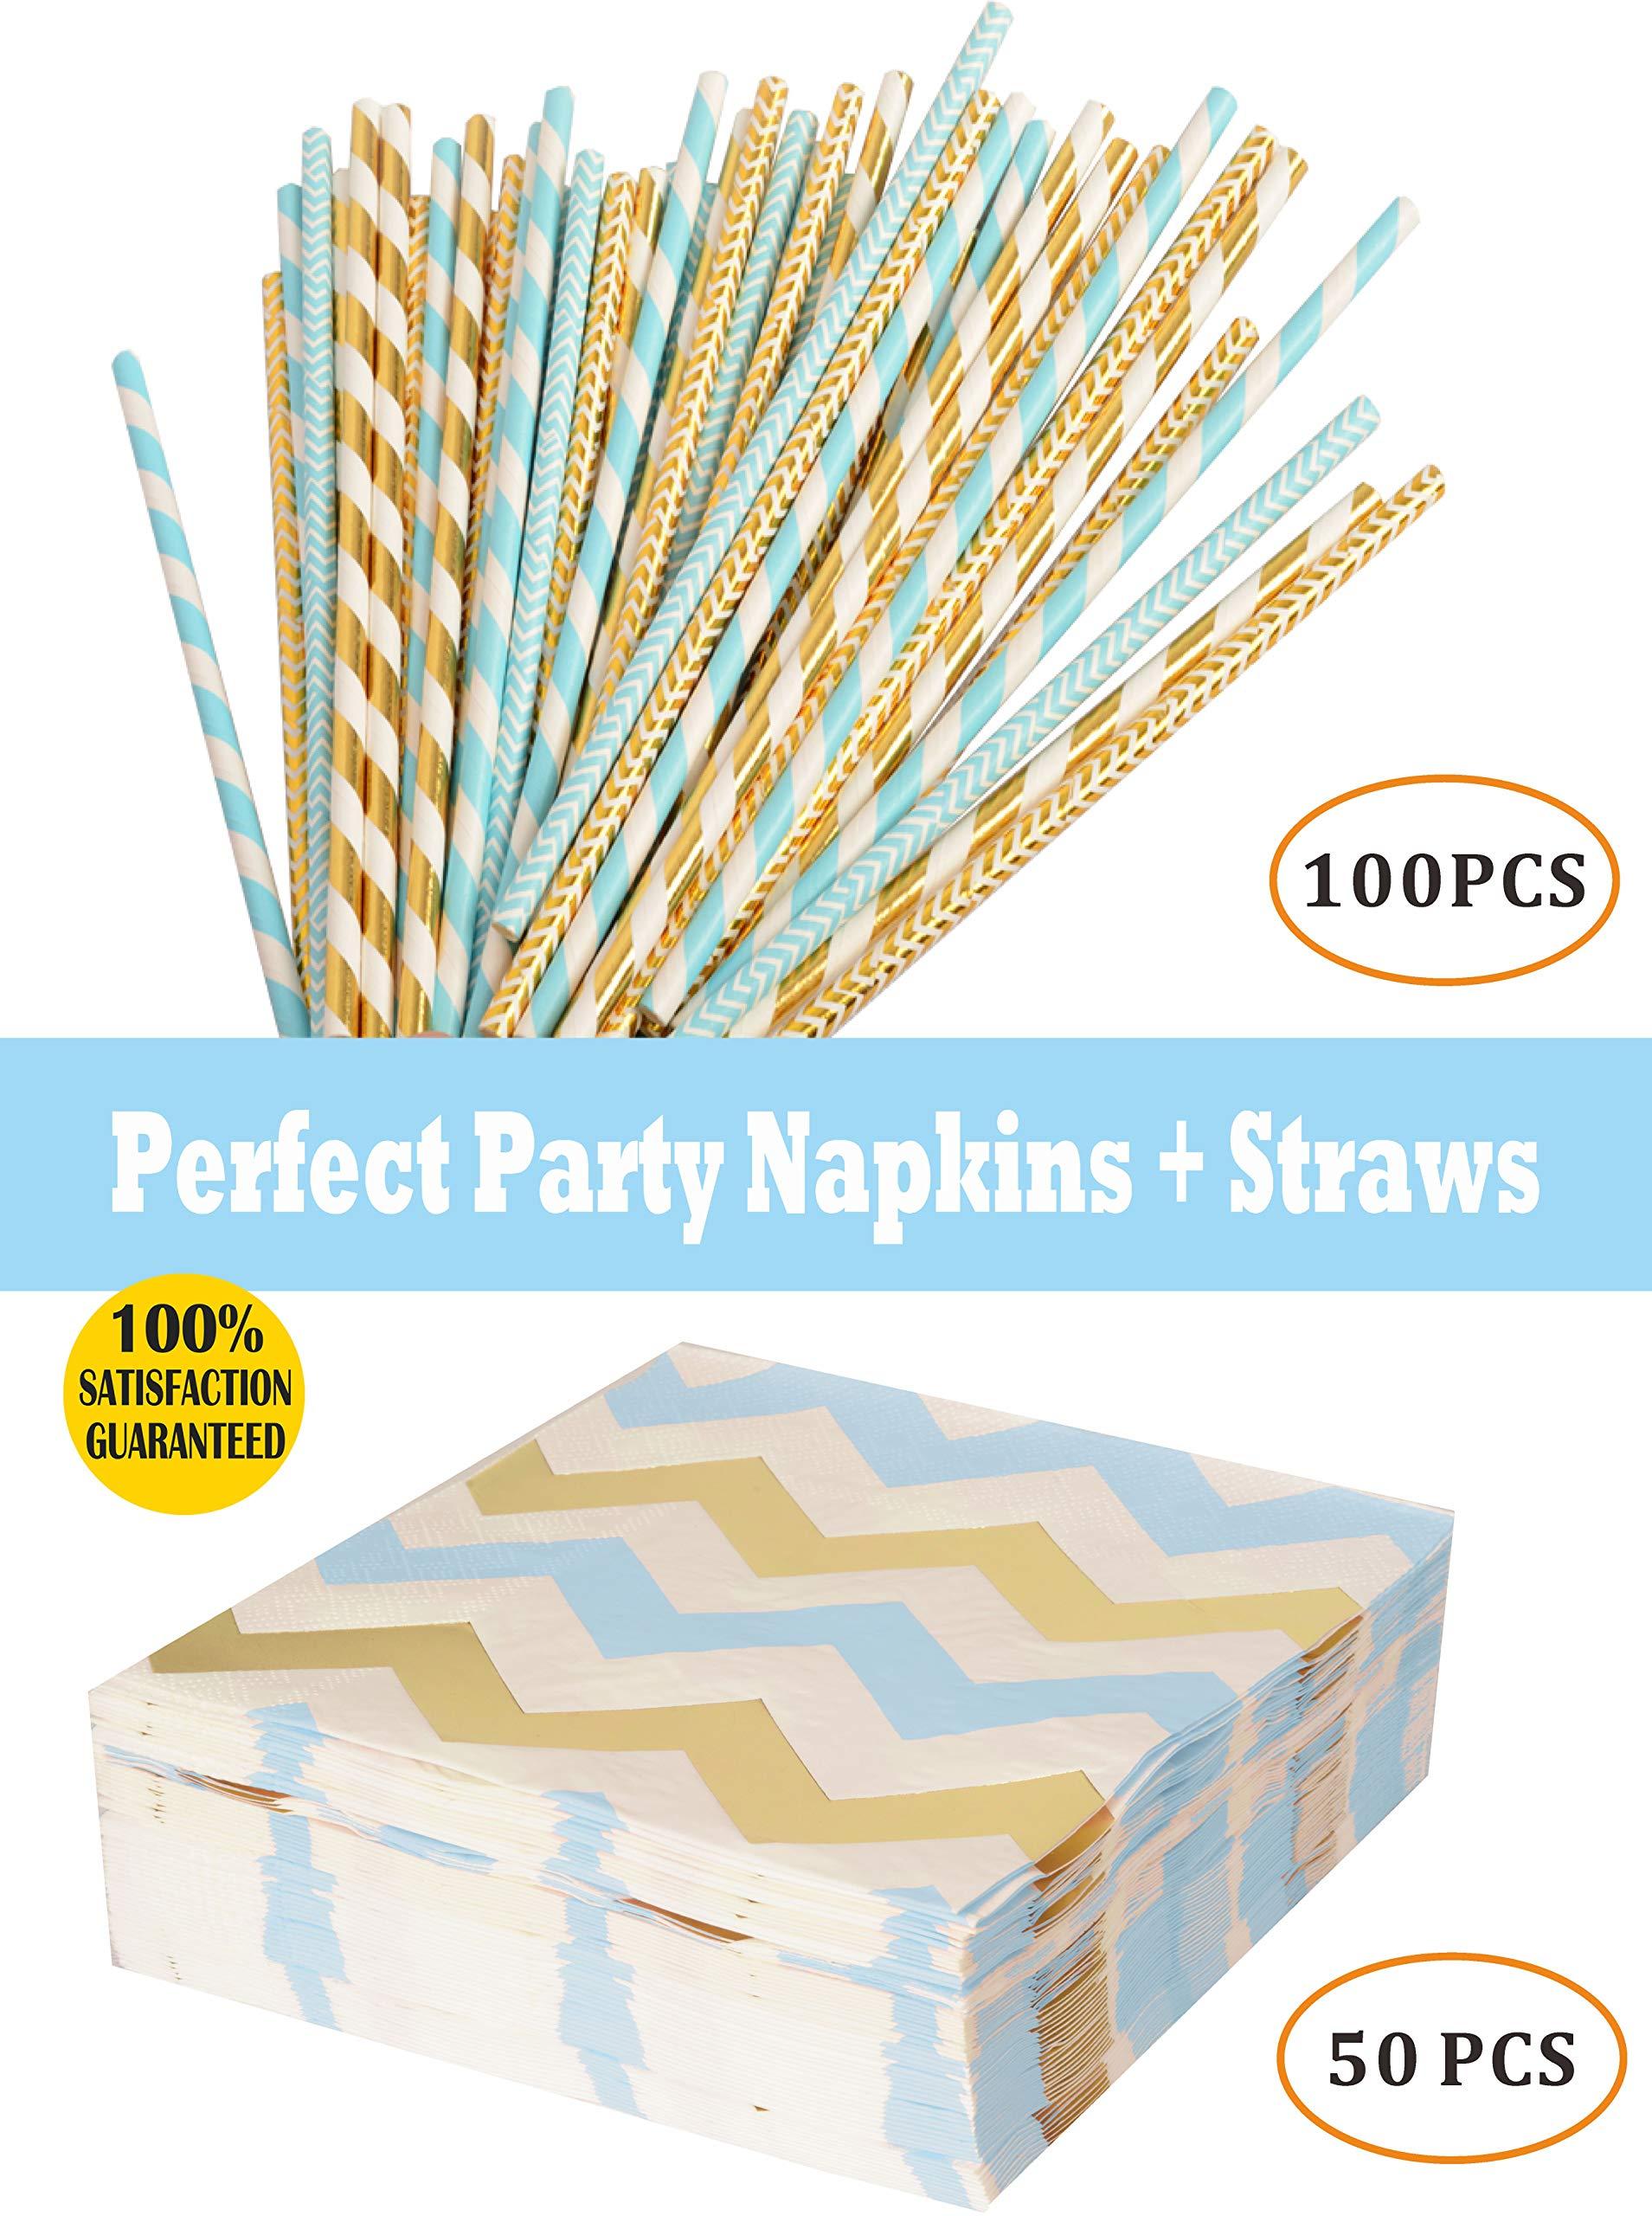 Meant2ToBe Blue Paper Straws Napkins, Baby Boy Shower Supplies, 100pc Boys Birthday Party Straws 50pc Napkins Parties, Birthdays, Weddings, Baby Showers Celebrations